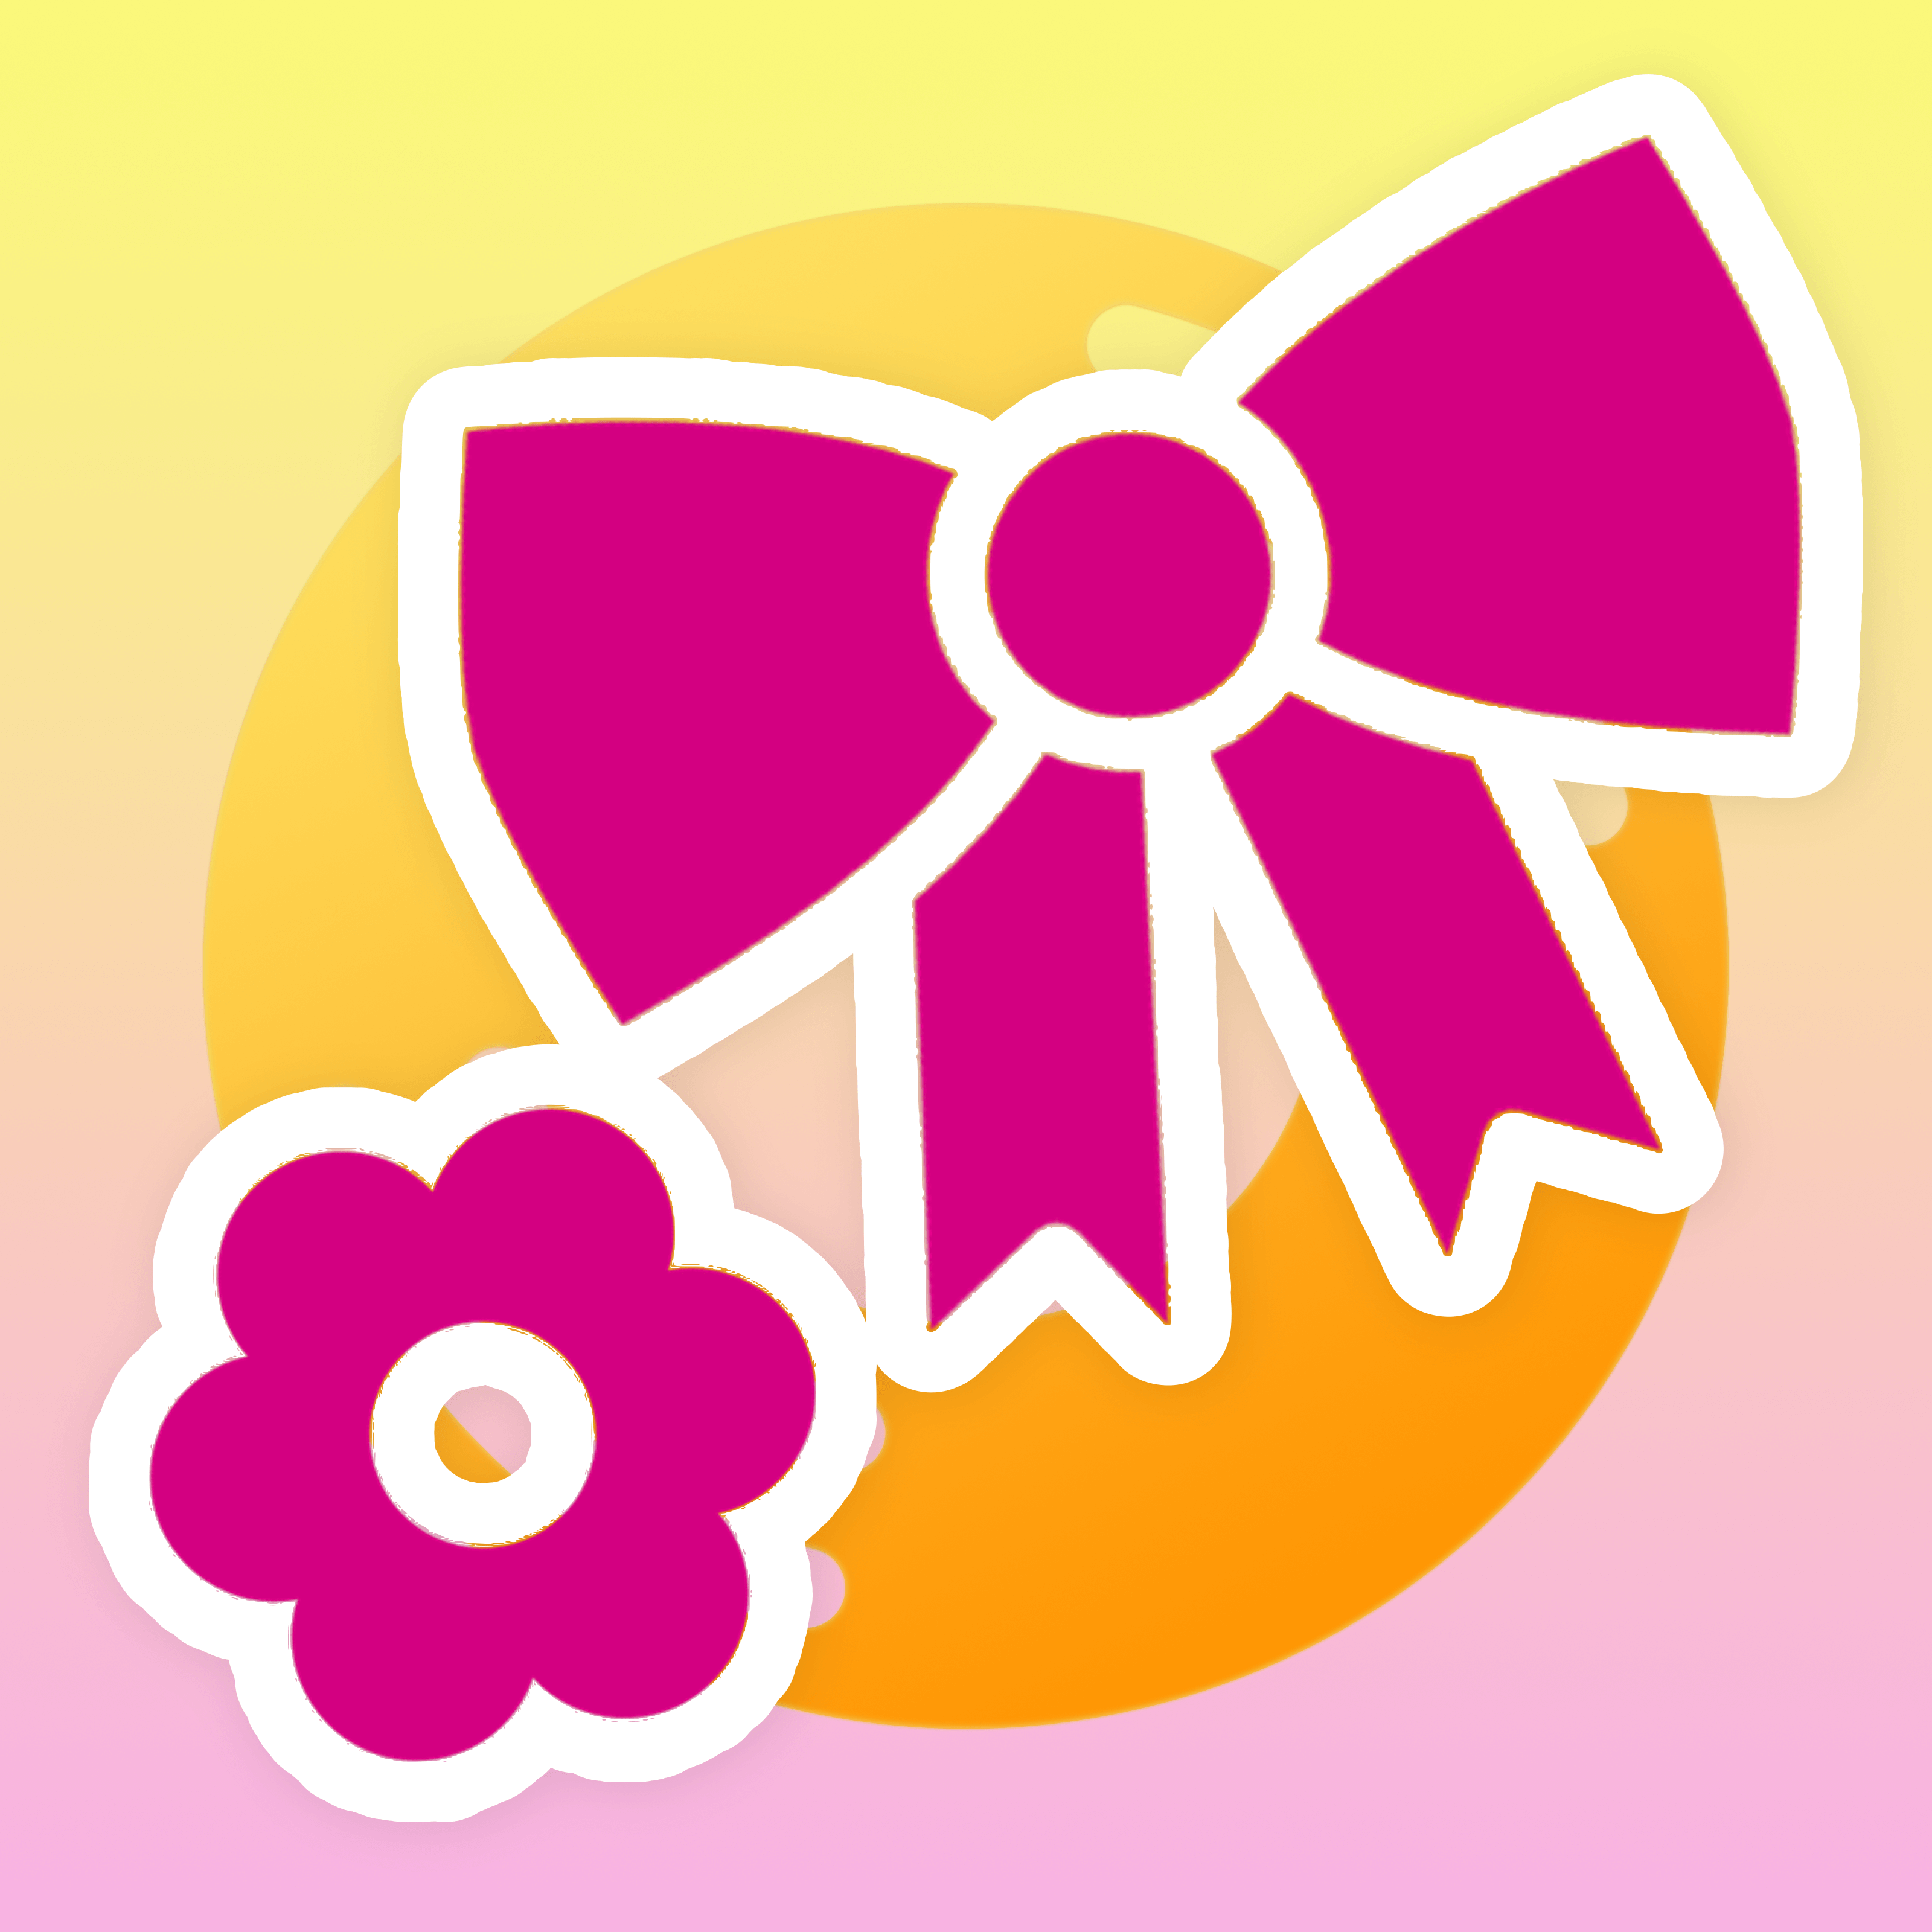 Maii avatar